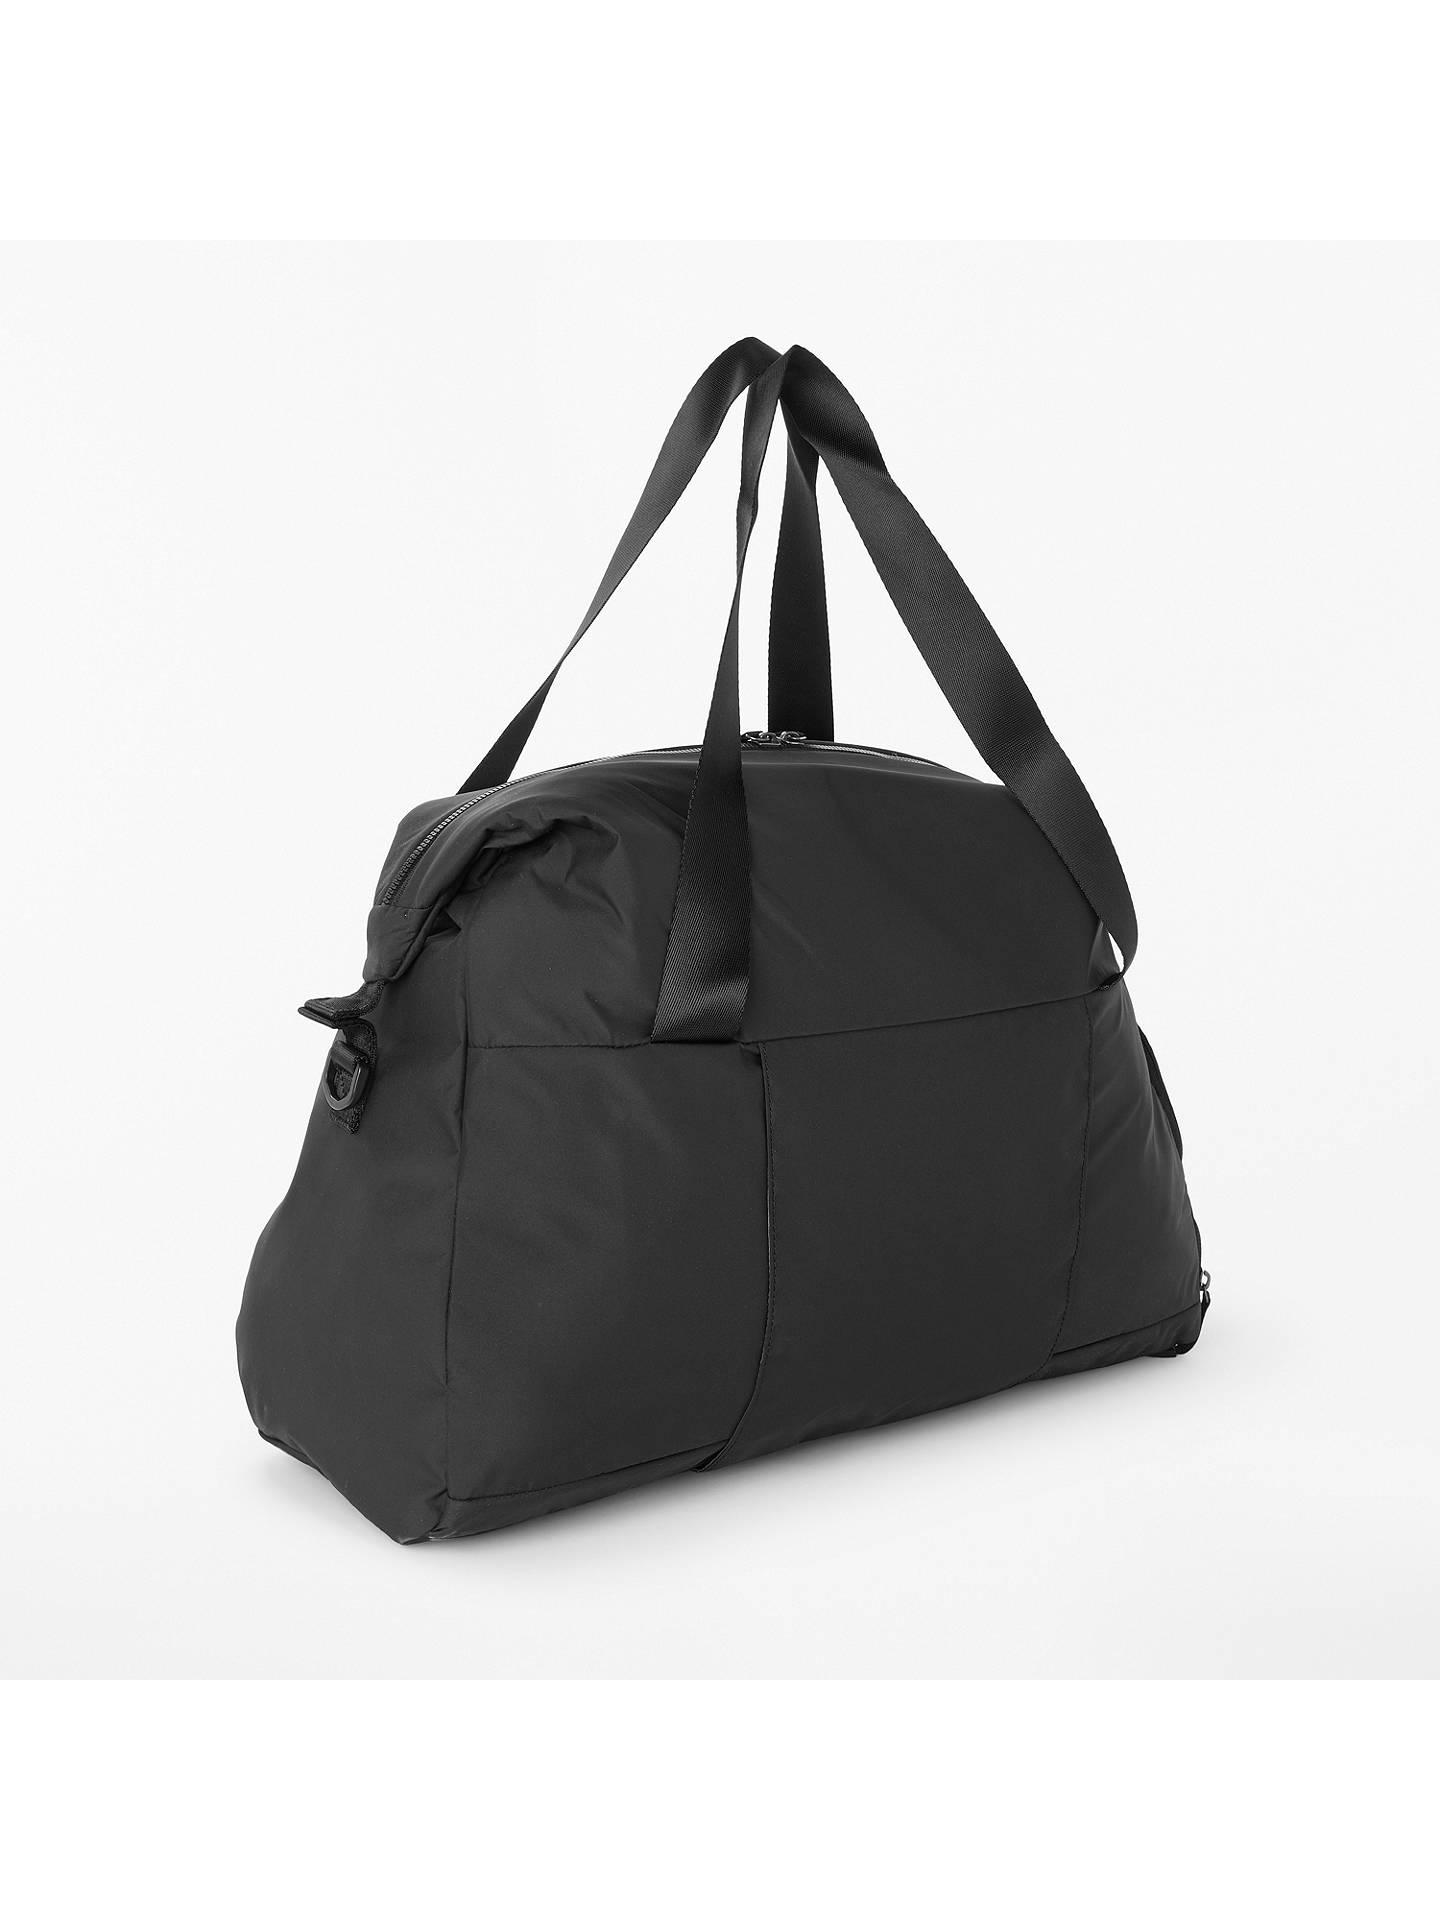 b65d681598c ... Buy Nike Legend Club Training Bag, Binary Blue/Black Online at  johnlewis.com ...